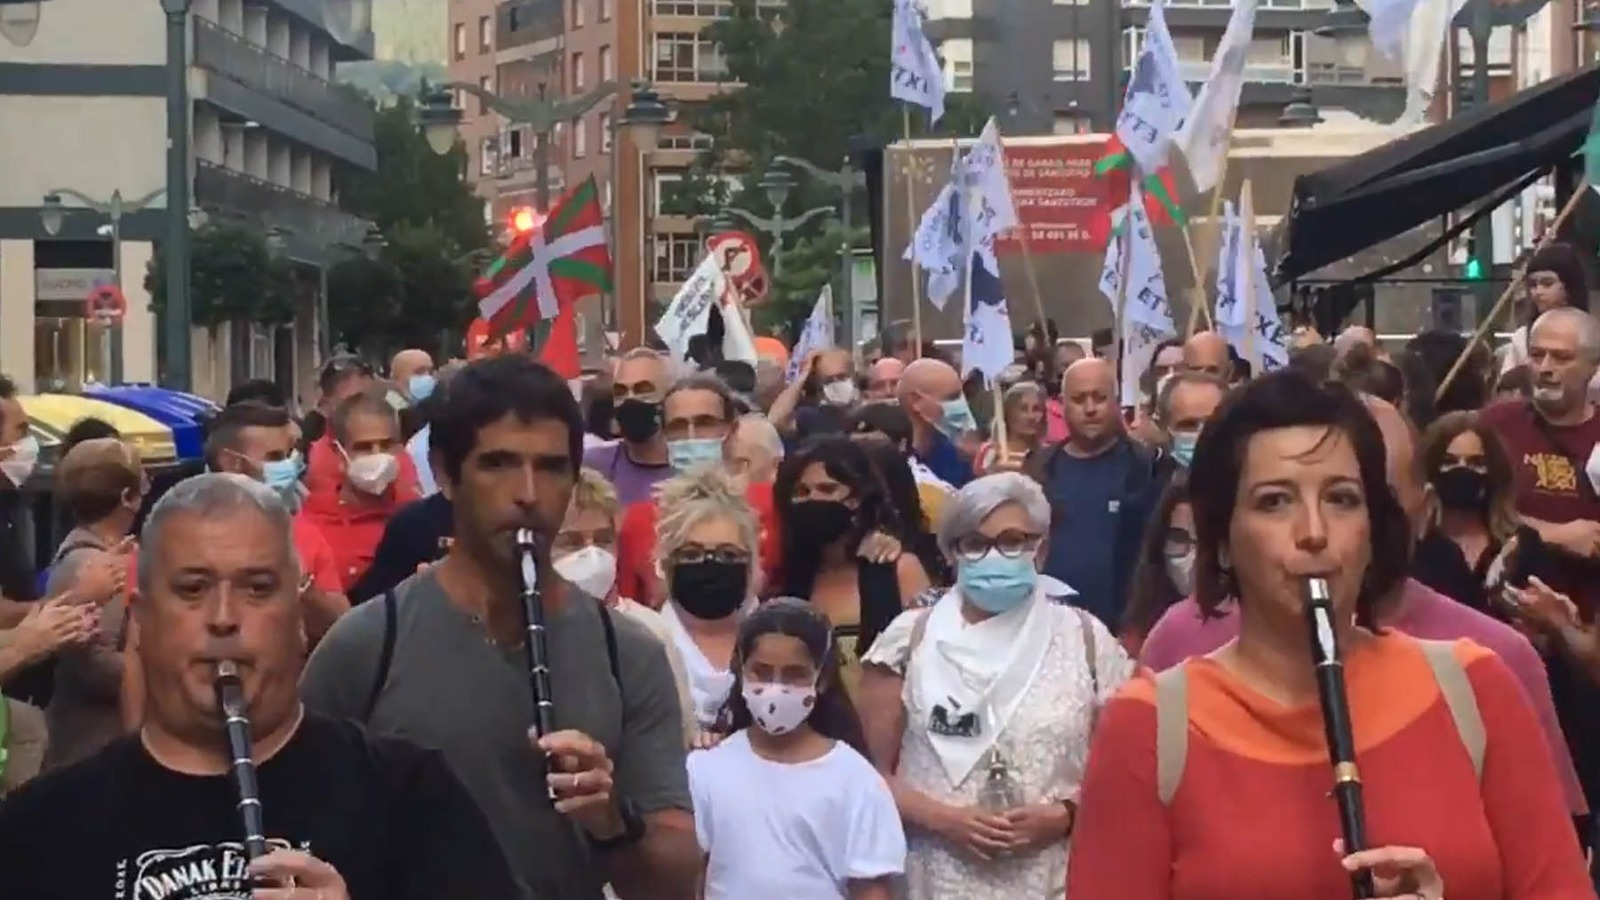 Manifestación en Bilbao en homenaje al etarra excarcelado Agustín Almaraz.